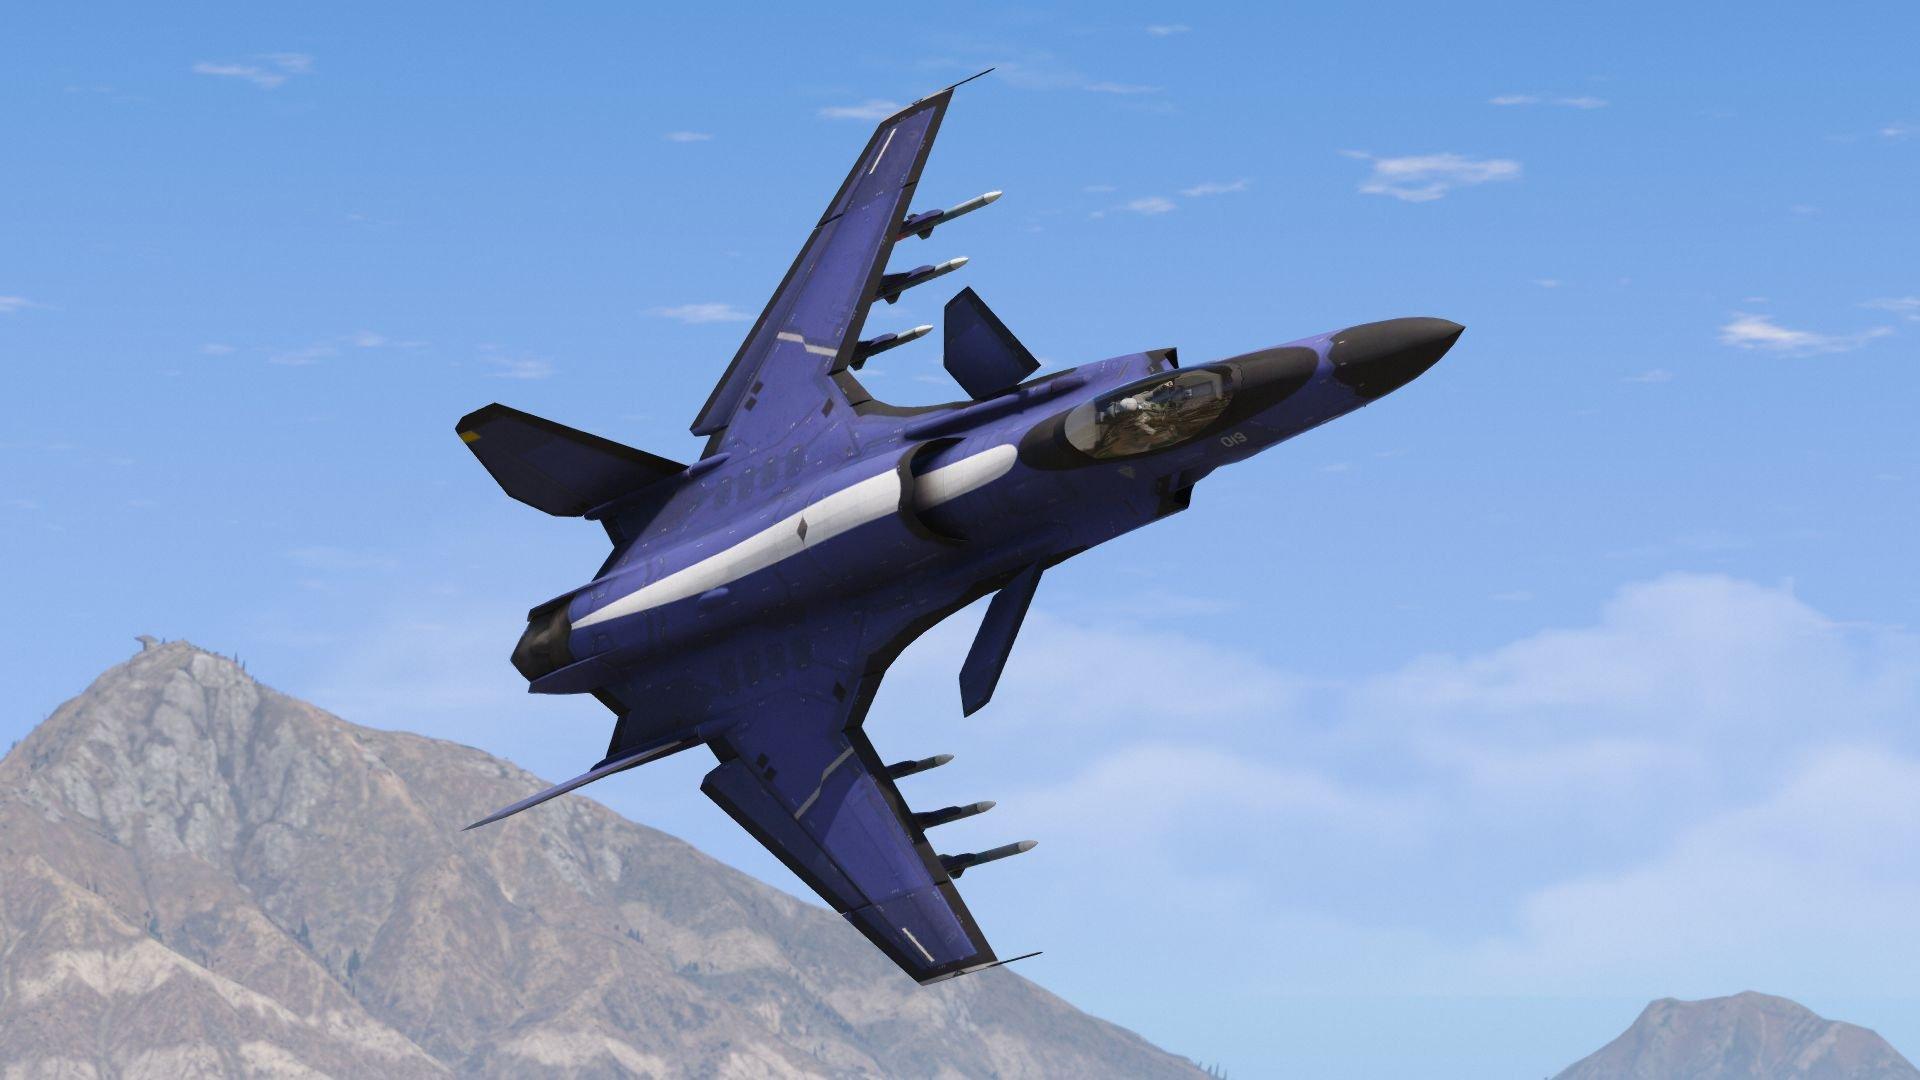 ASF-X Shinden II (Ace Combat) [Add-On] - GTA5-Mods.com